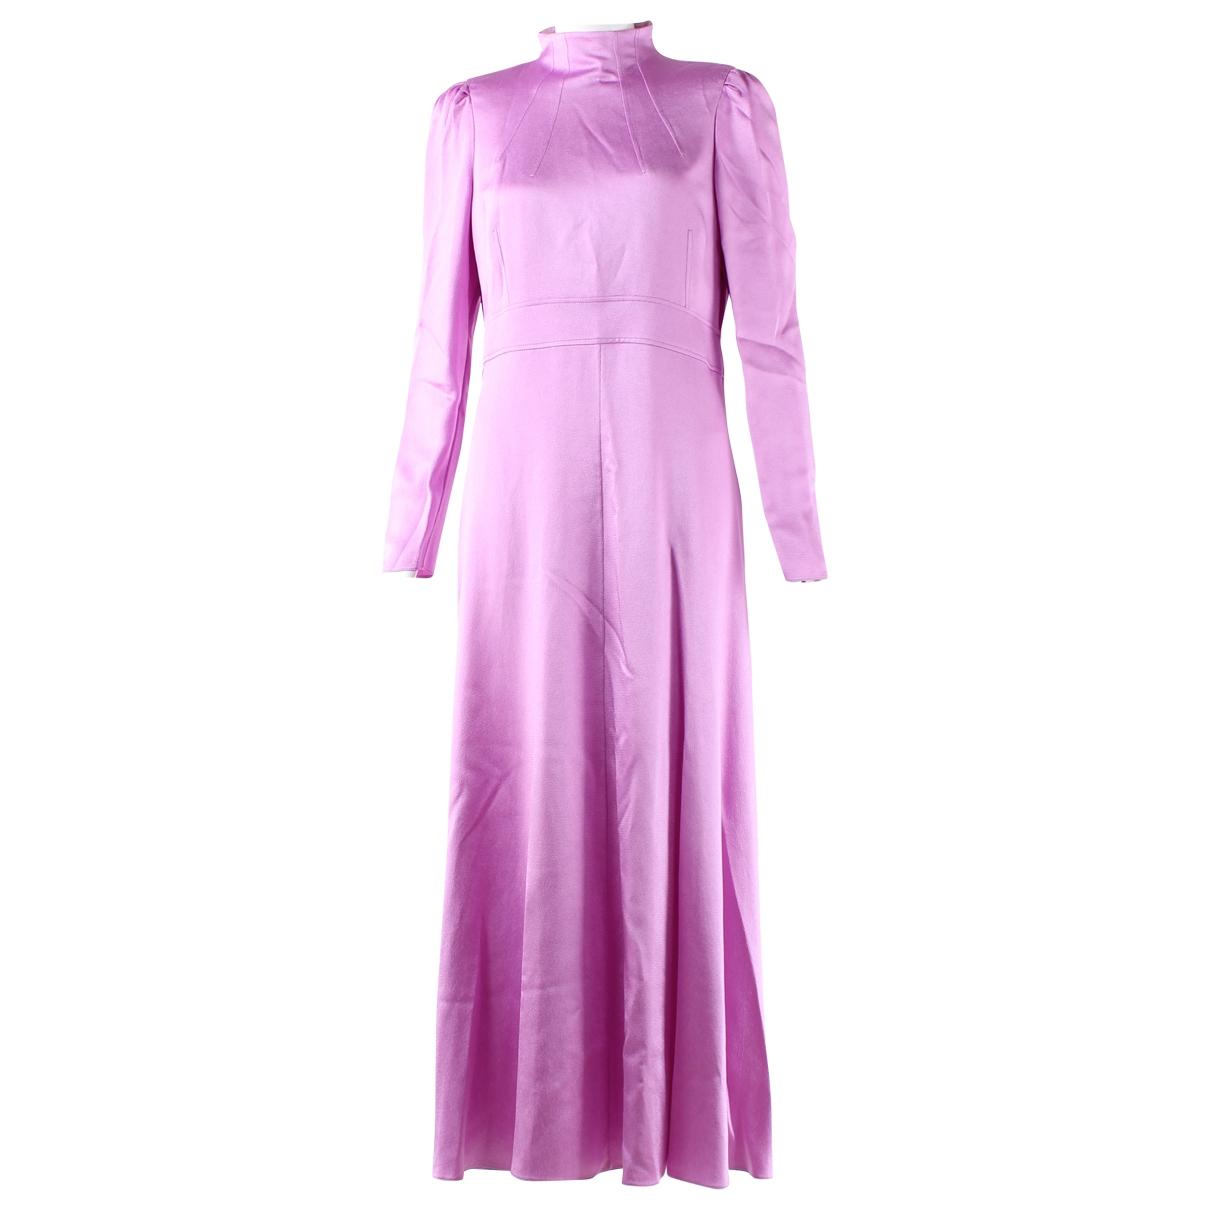 Valentino Garavani \N Pink dress for Women 44 IT